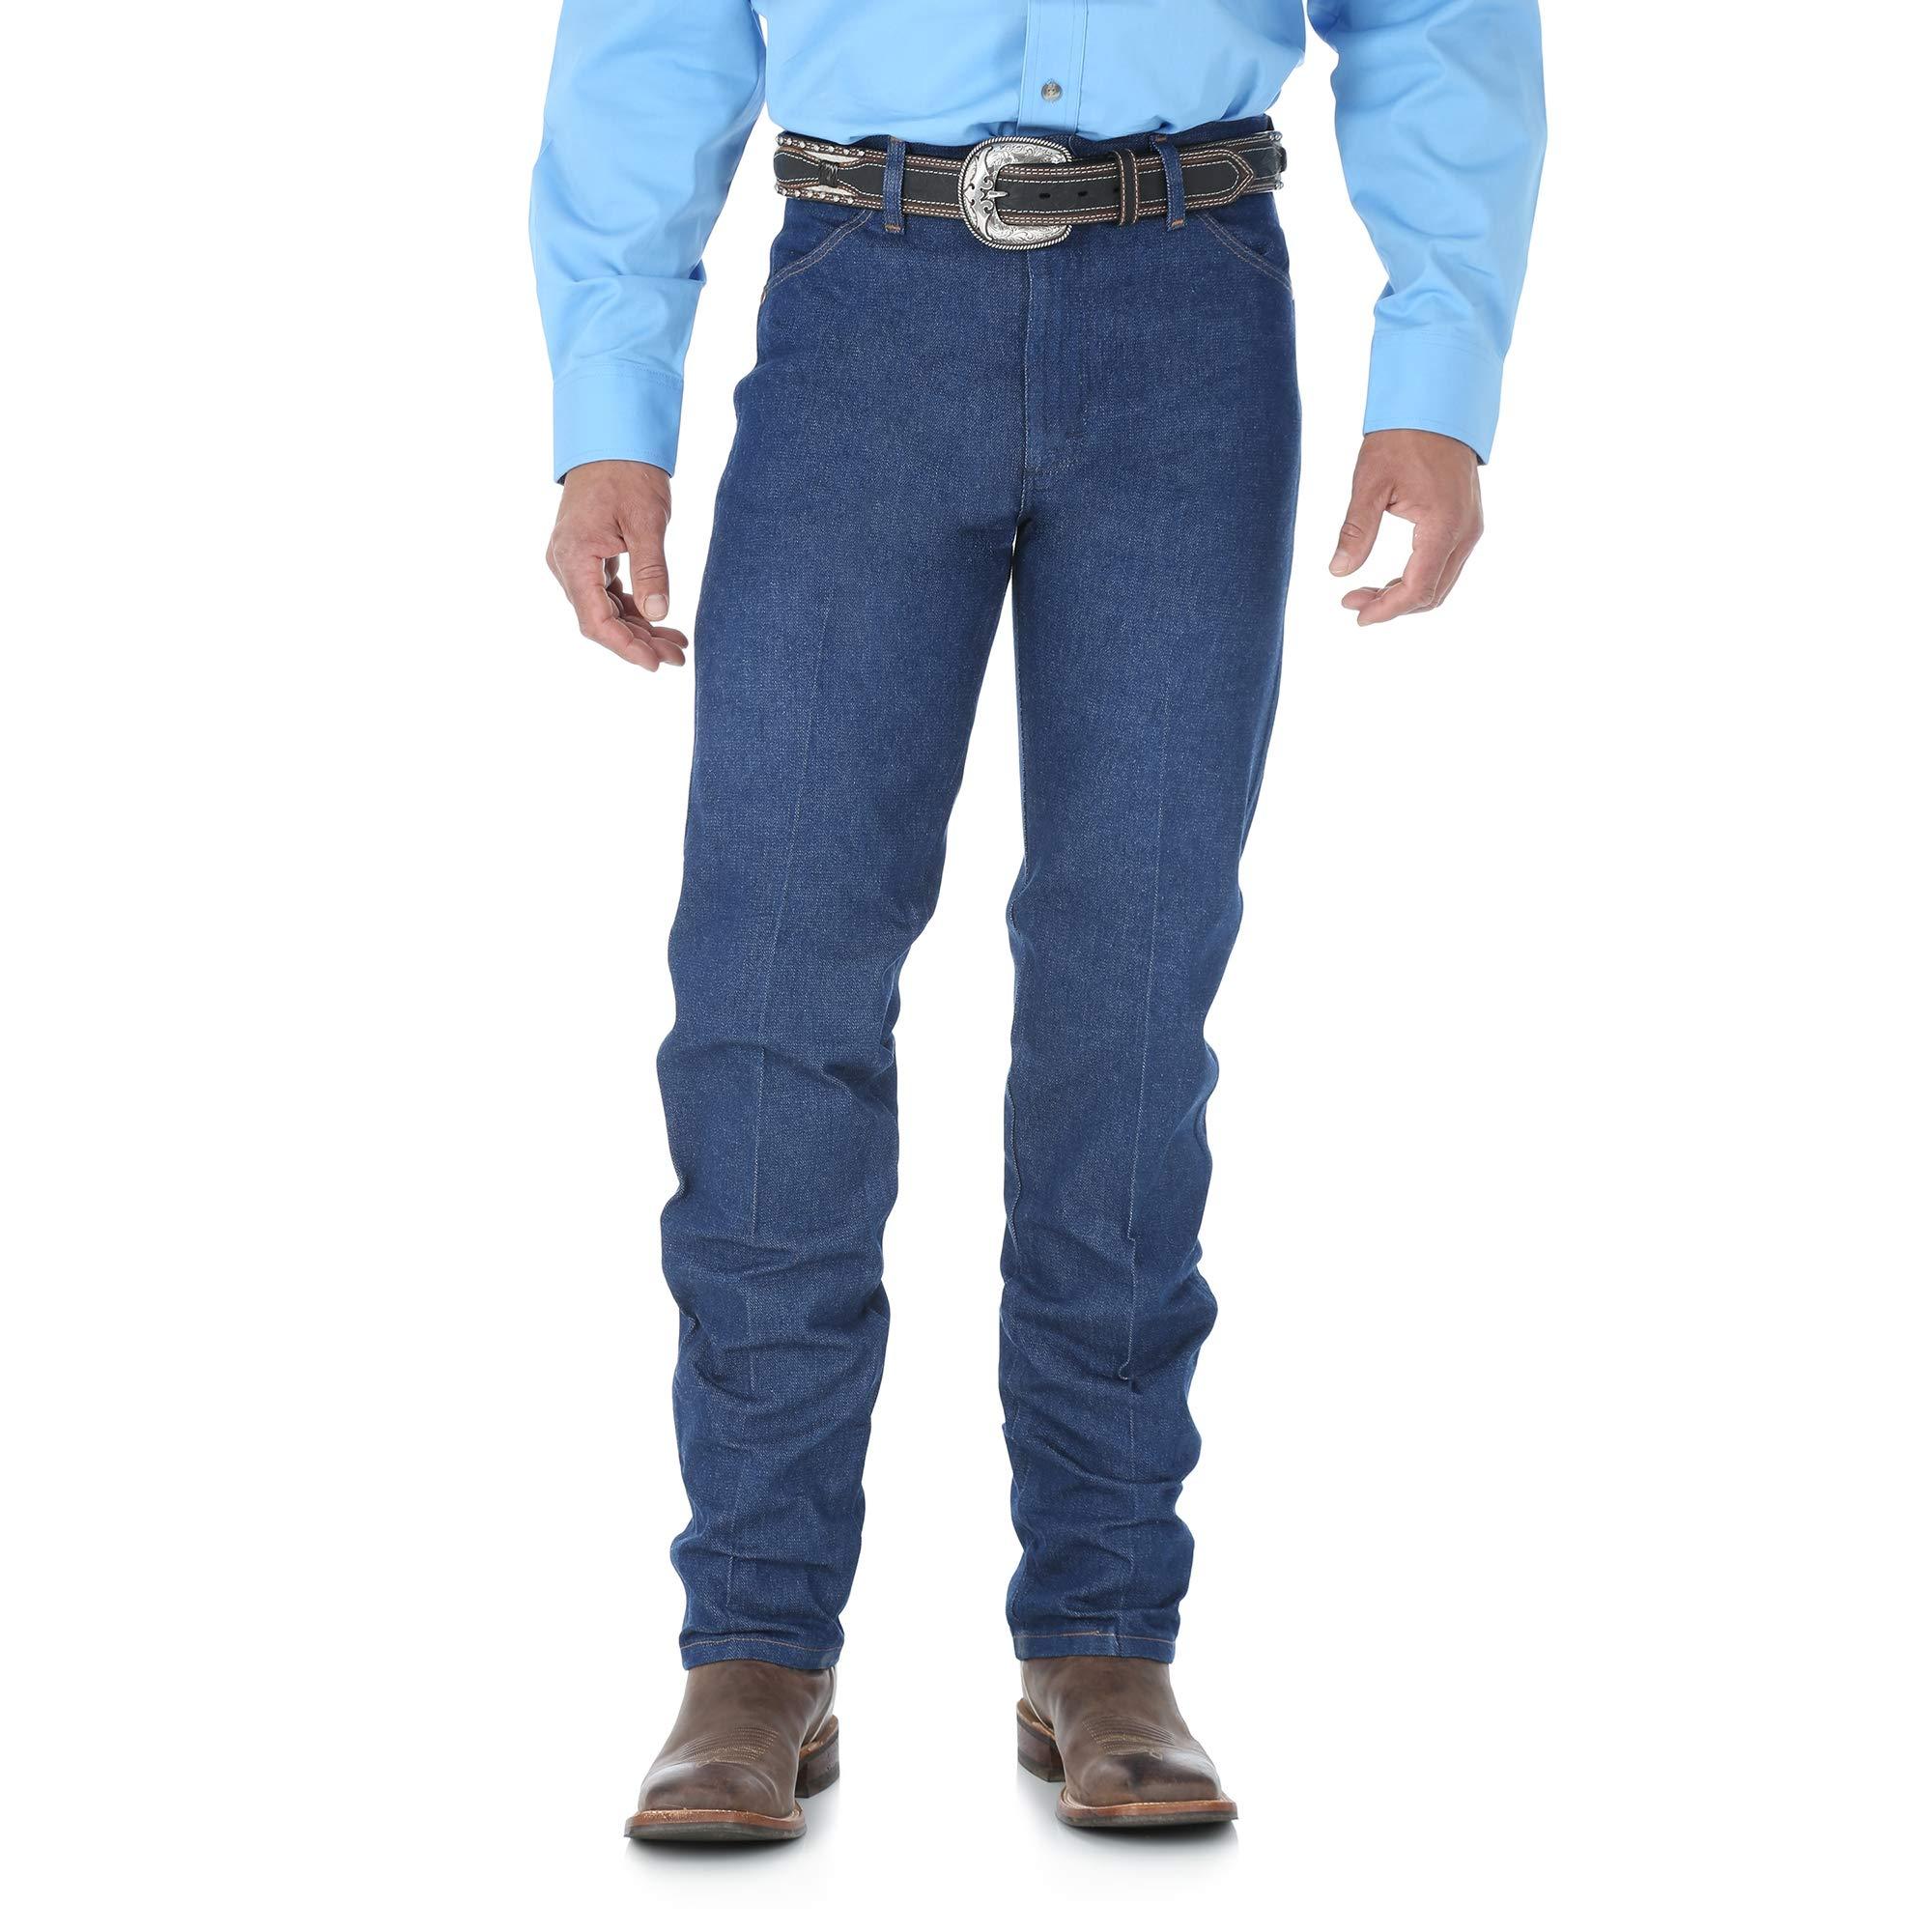 Wrangler Men's Tall Cowboy Cut Jean Original Fit Jean,Indigo,33x38